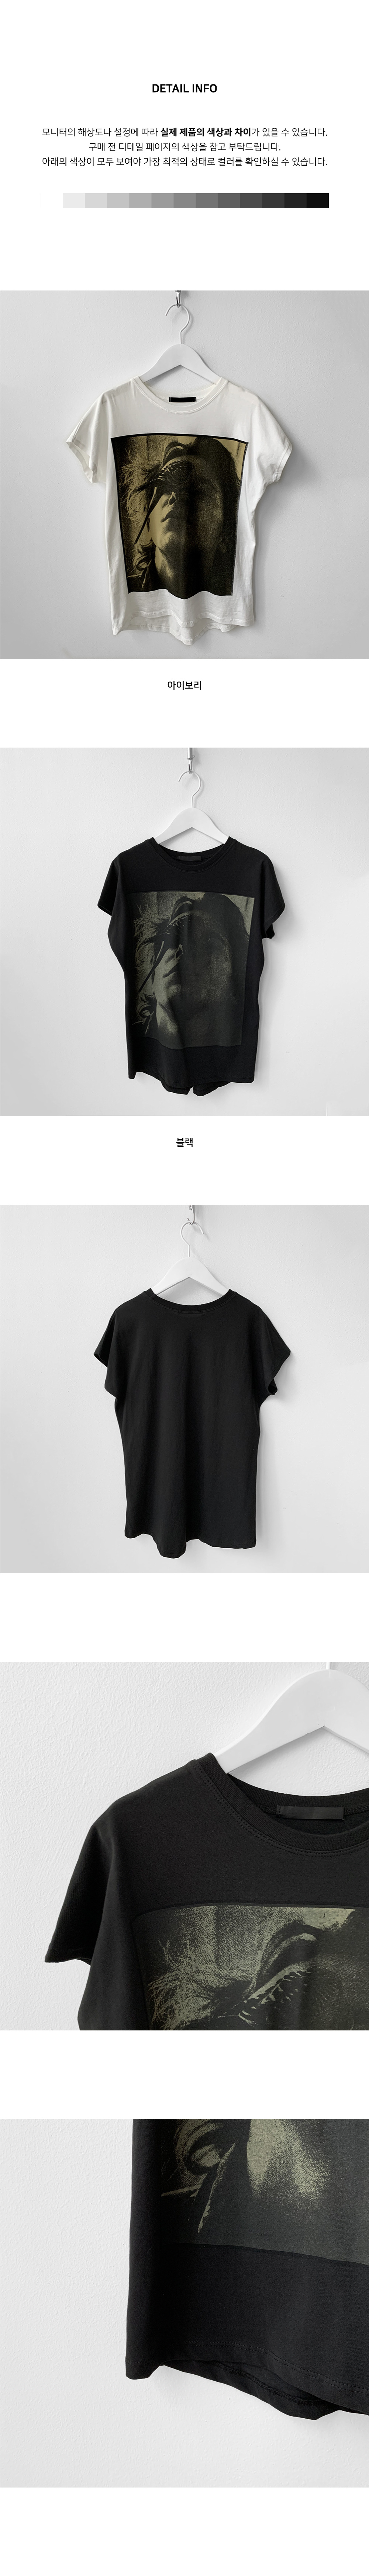 Hey Vintage Print Short Sleeve T-shirt